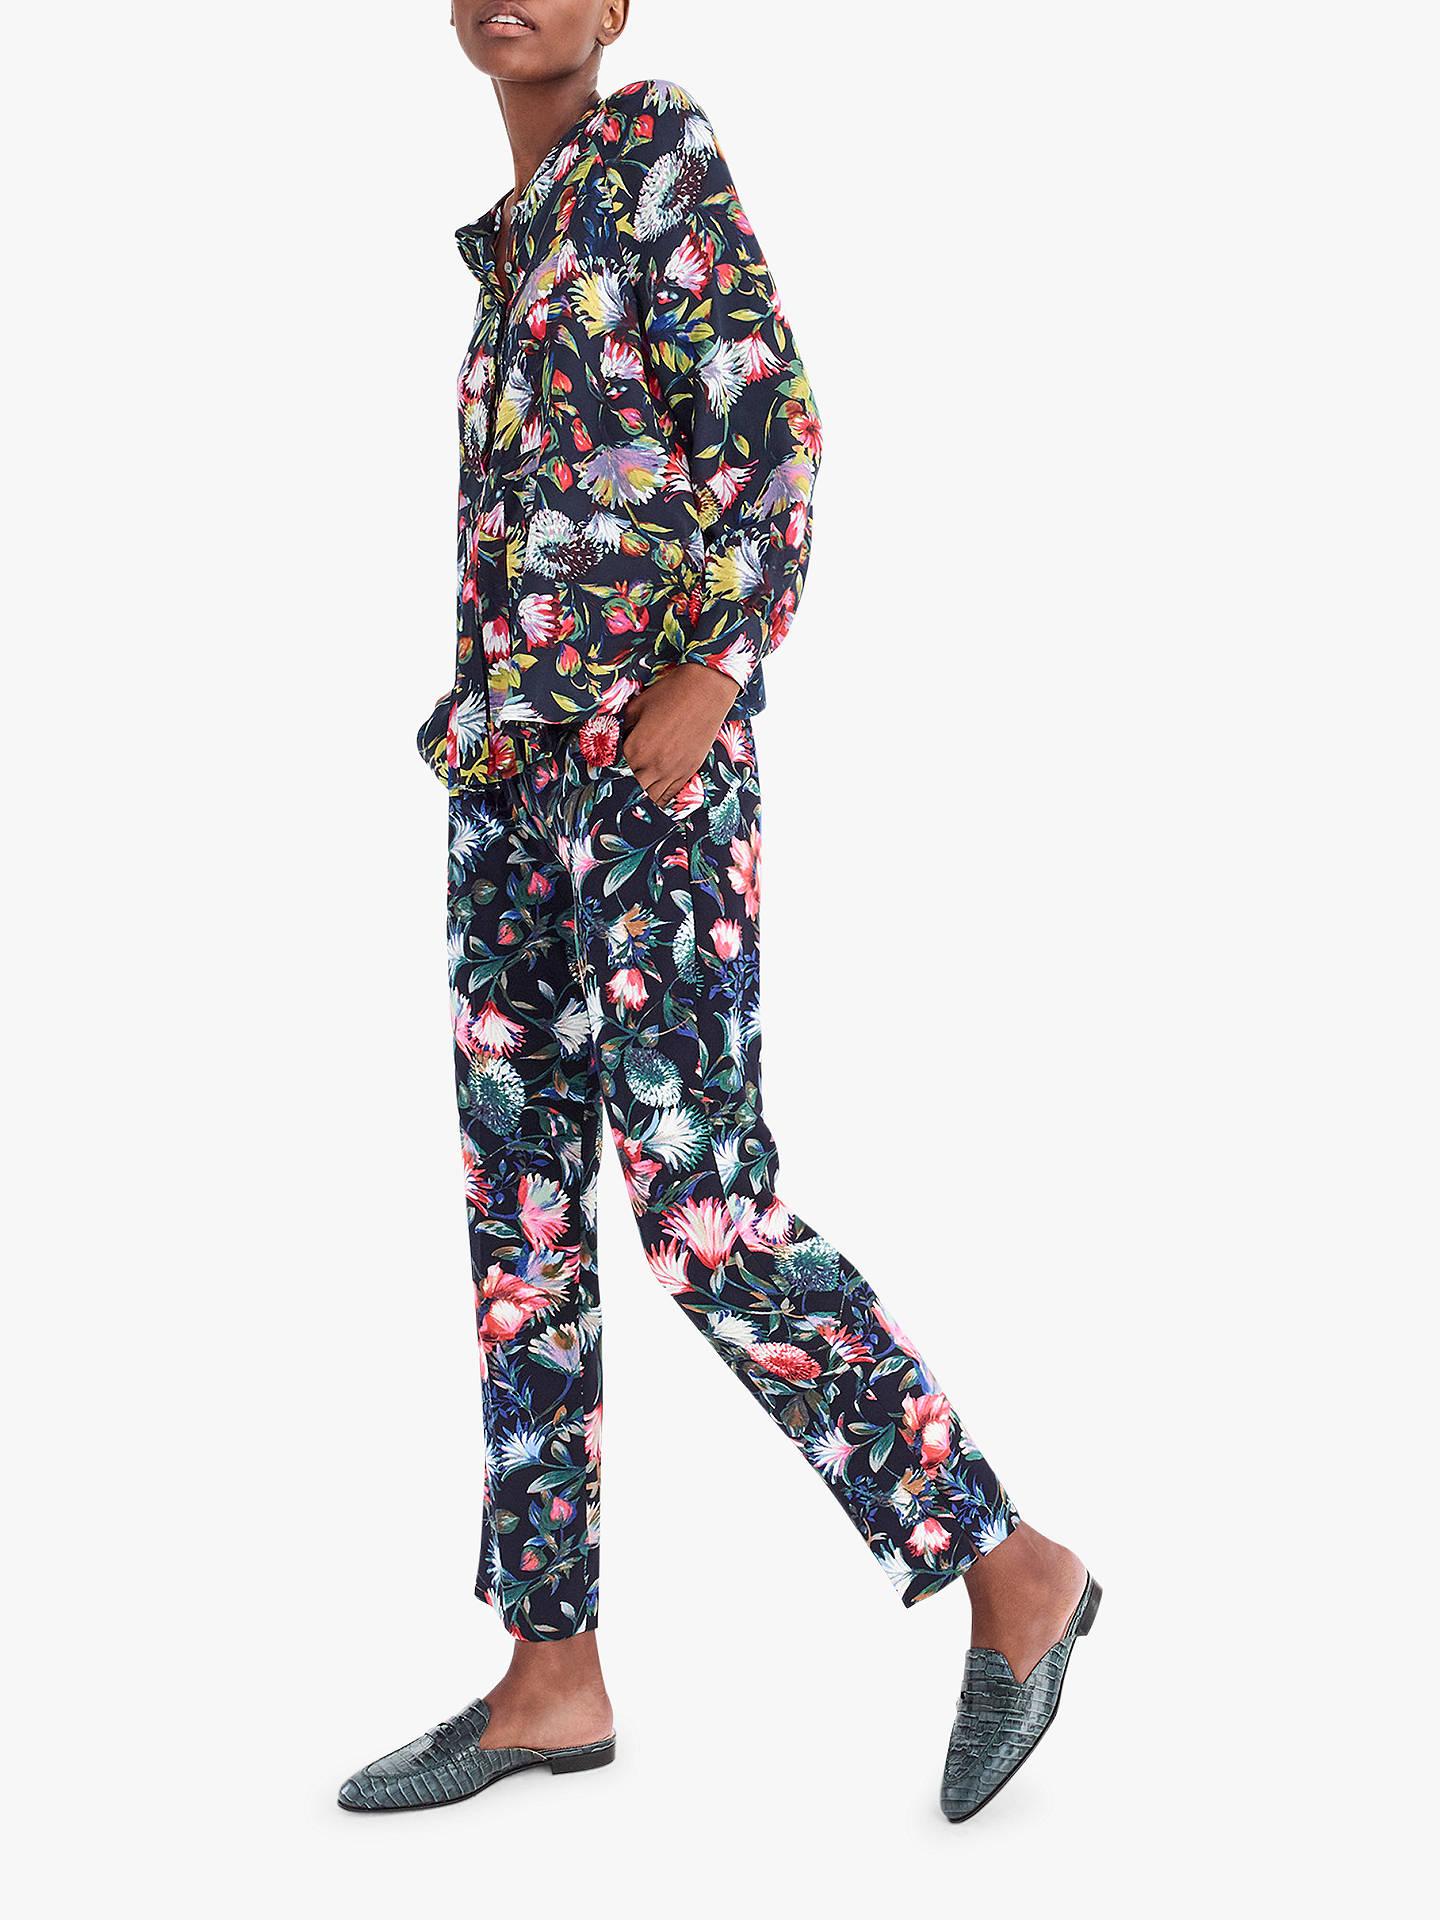 b8a6cdf5bdd74 Buy J.Crew Verity Floral Long Sleeve Silk Blouse